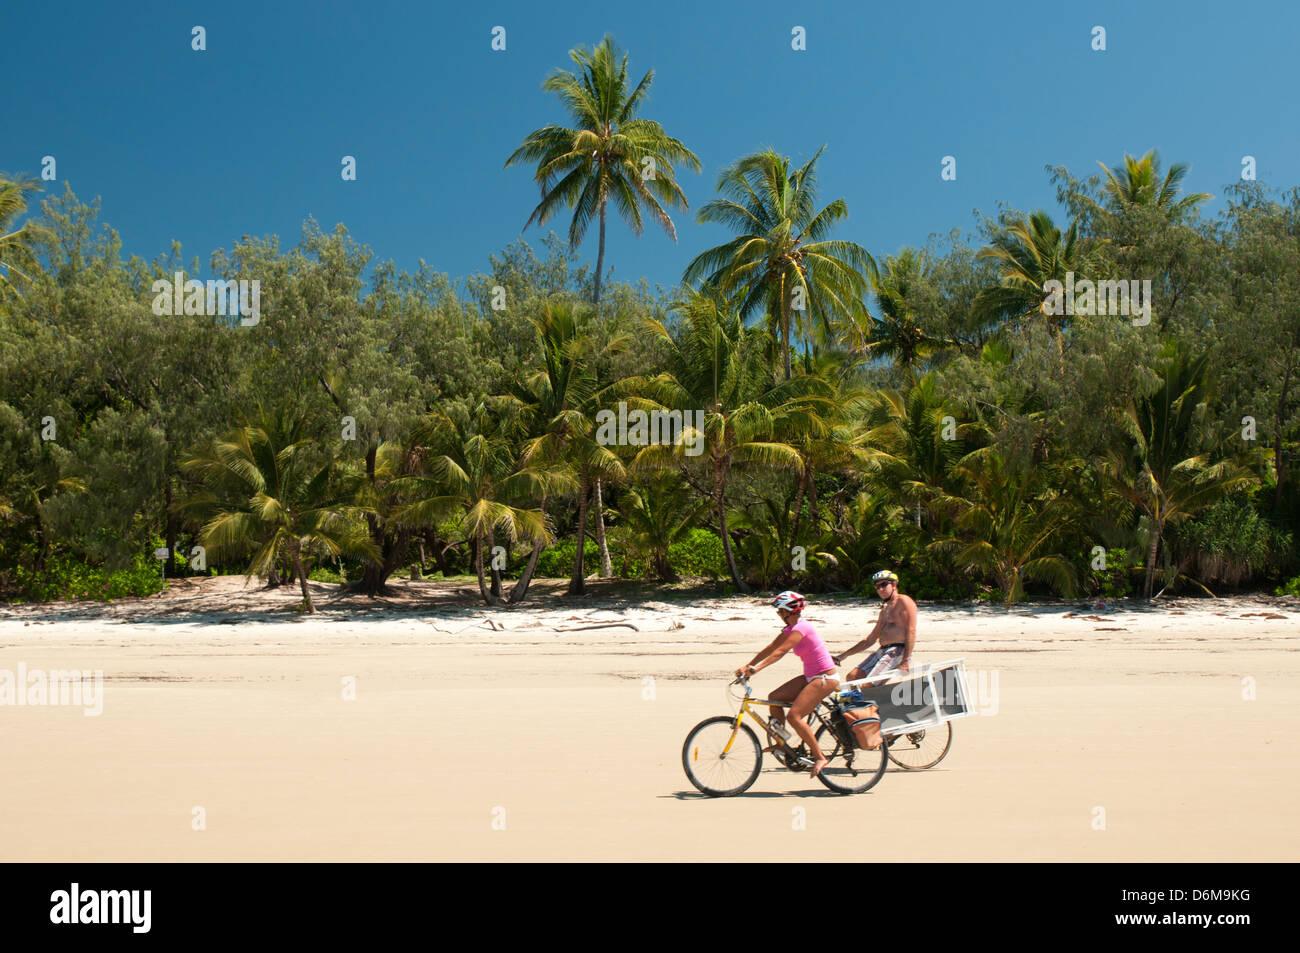 beach at Port Douglas, Far North Queensland, Australia - Stock Image